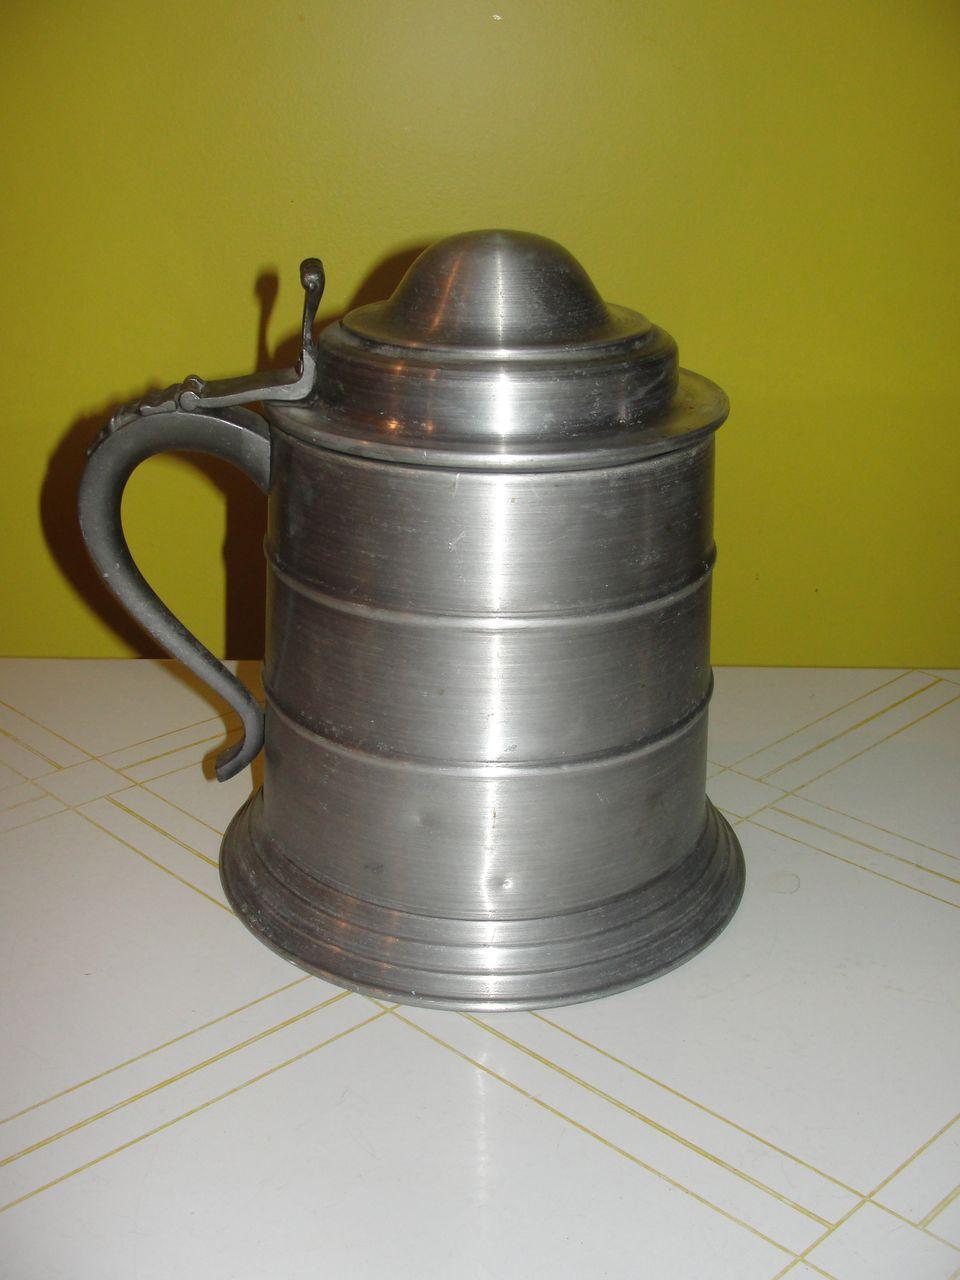 Giant Stein Insulated Ice Bucket - b128